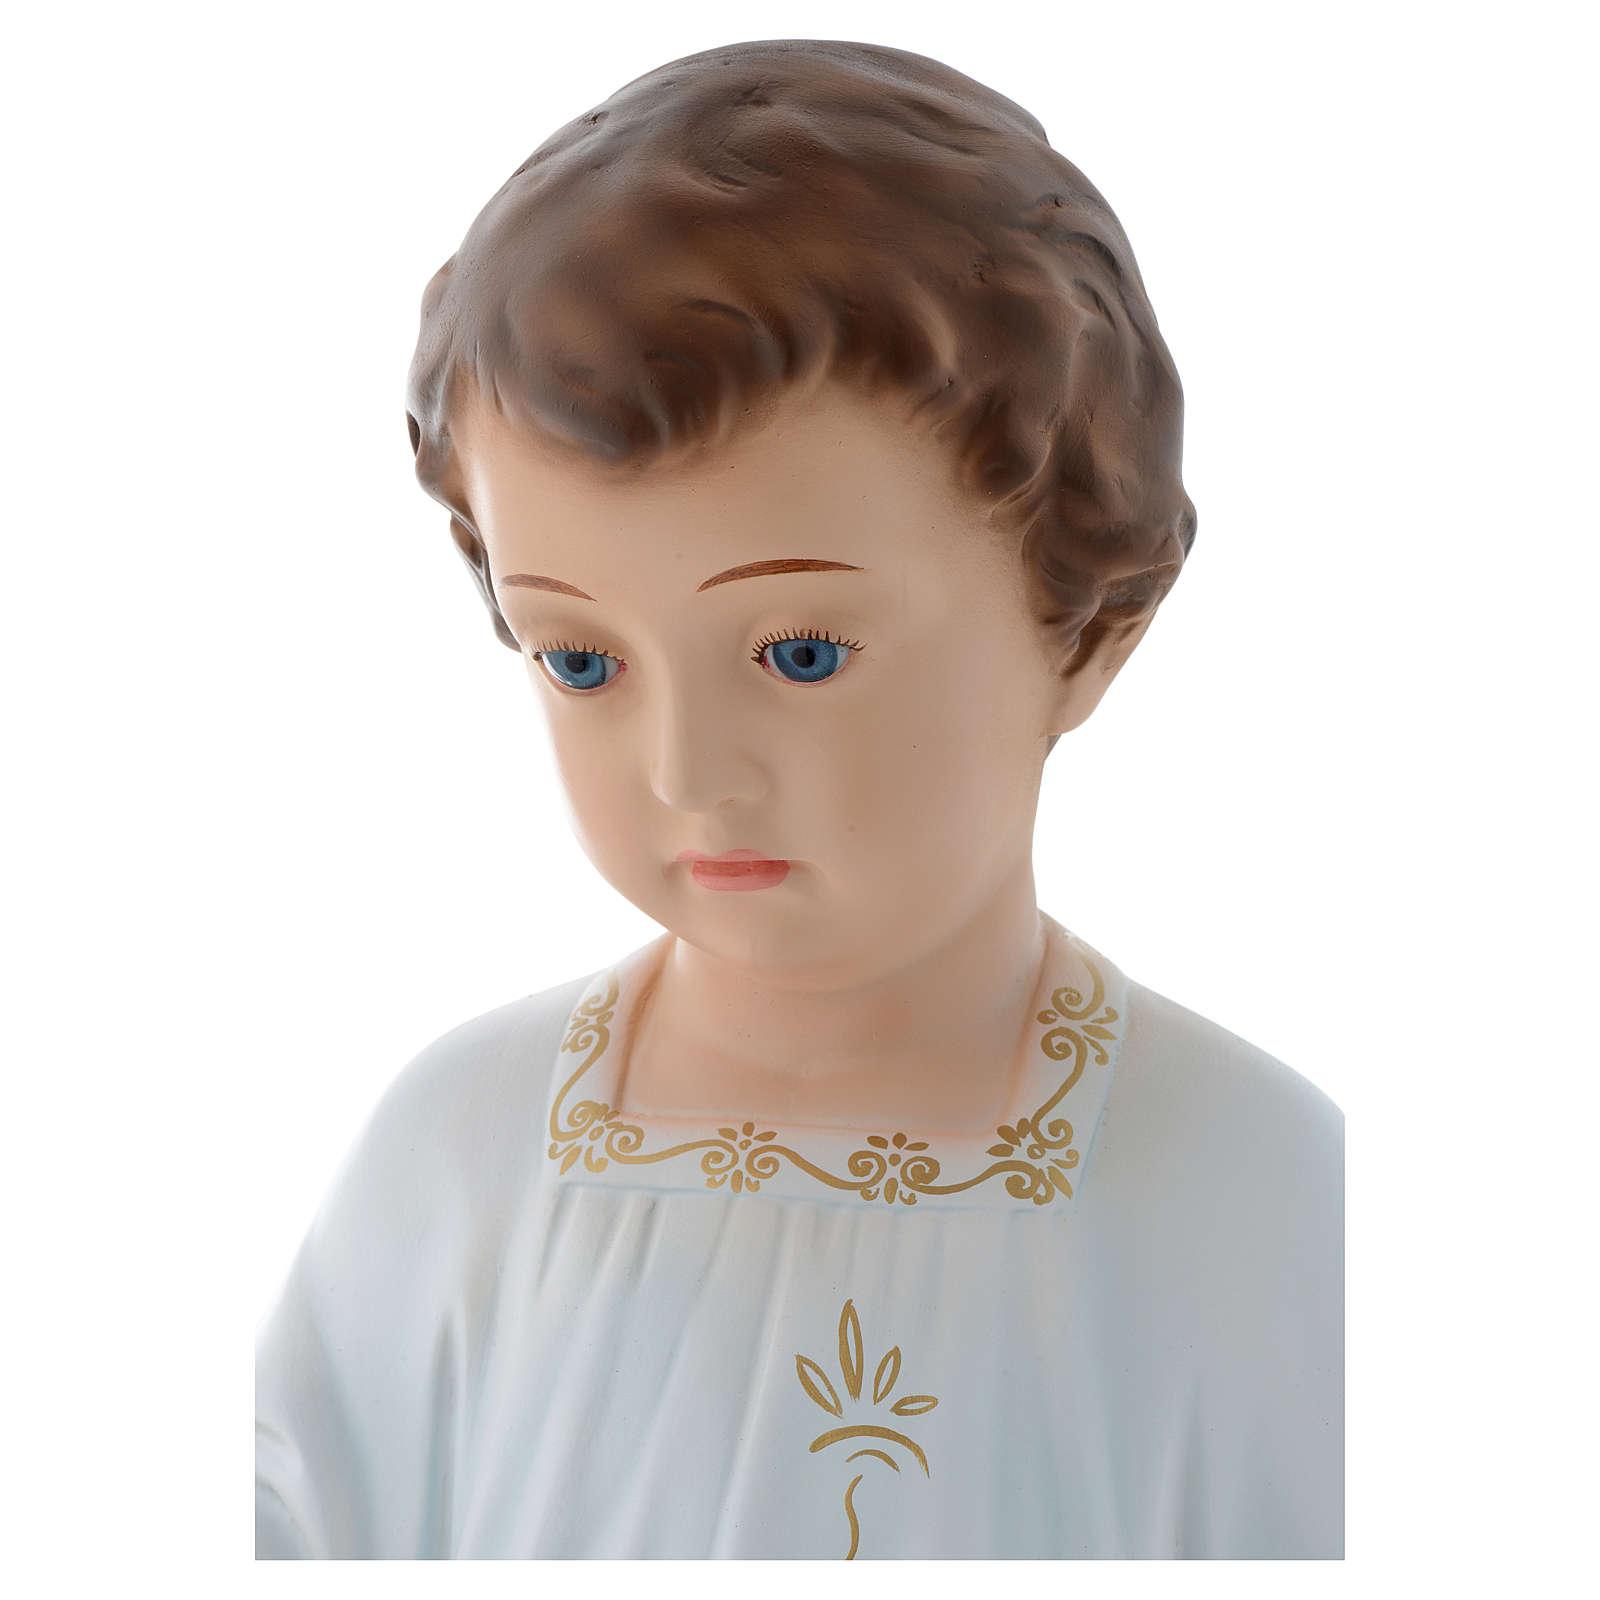 Baby Jesus Holy Childhood figurine 75cm by Landi with crystal eyes 3